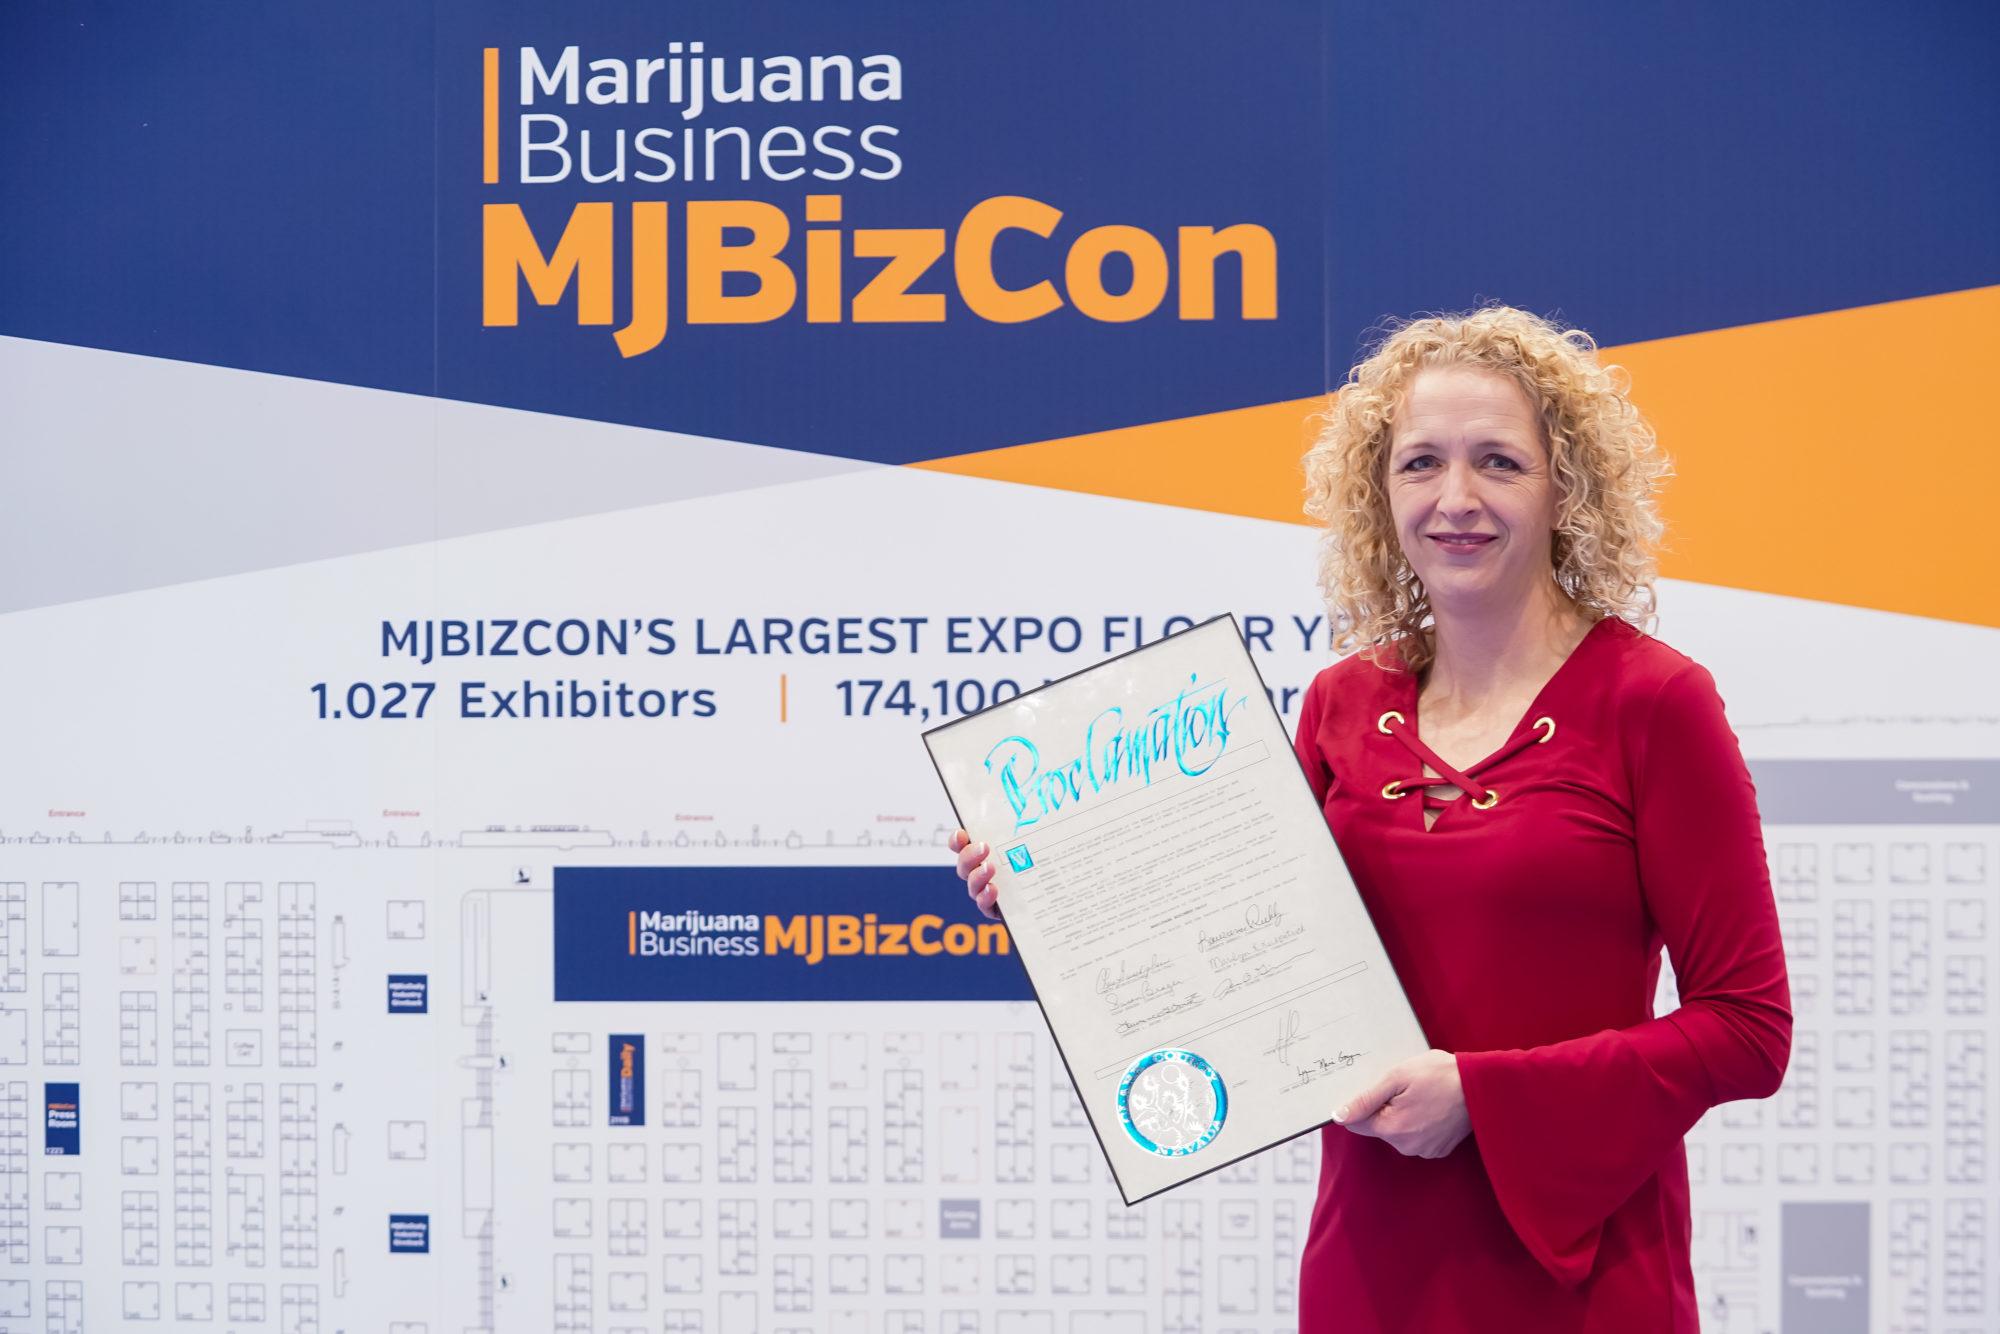 2019 MJ Biz Con, Las Vegas - December 11-13th